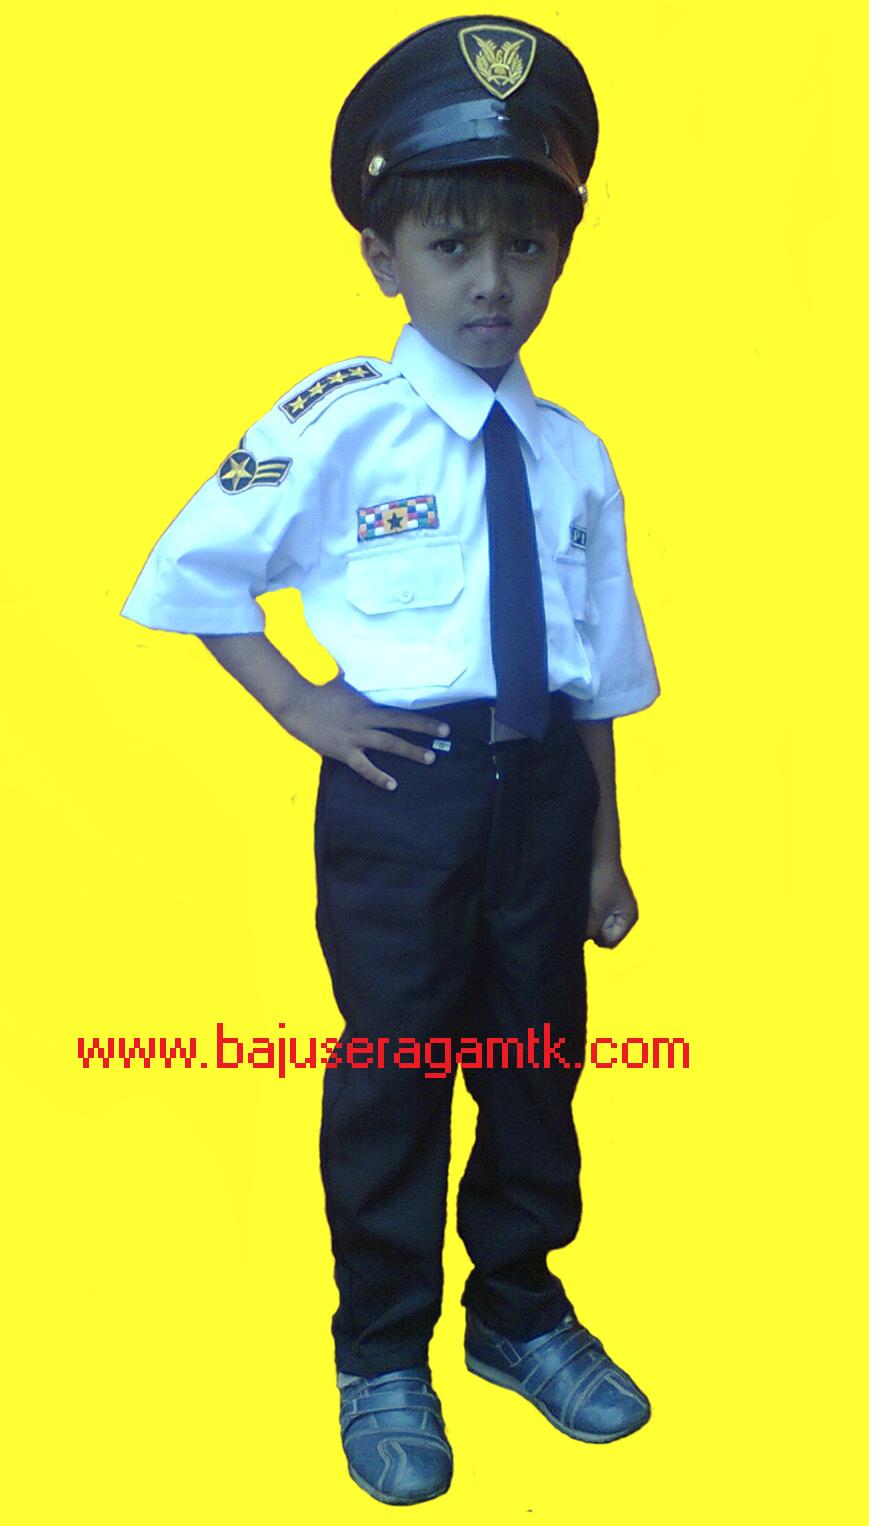 Http Bajuprofesianakbajuseragamtkcom Kostum Baju Perawat